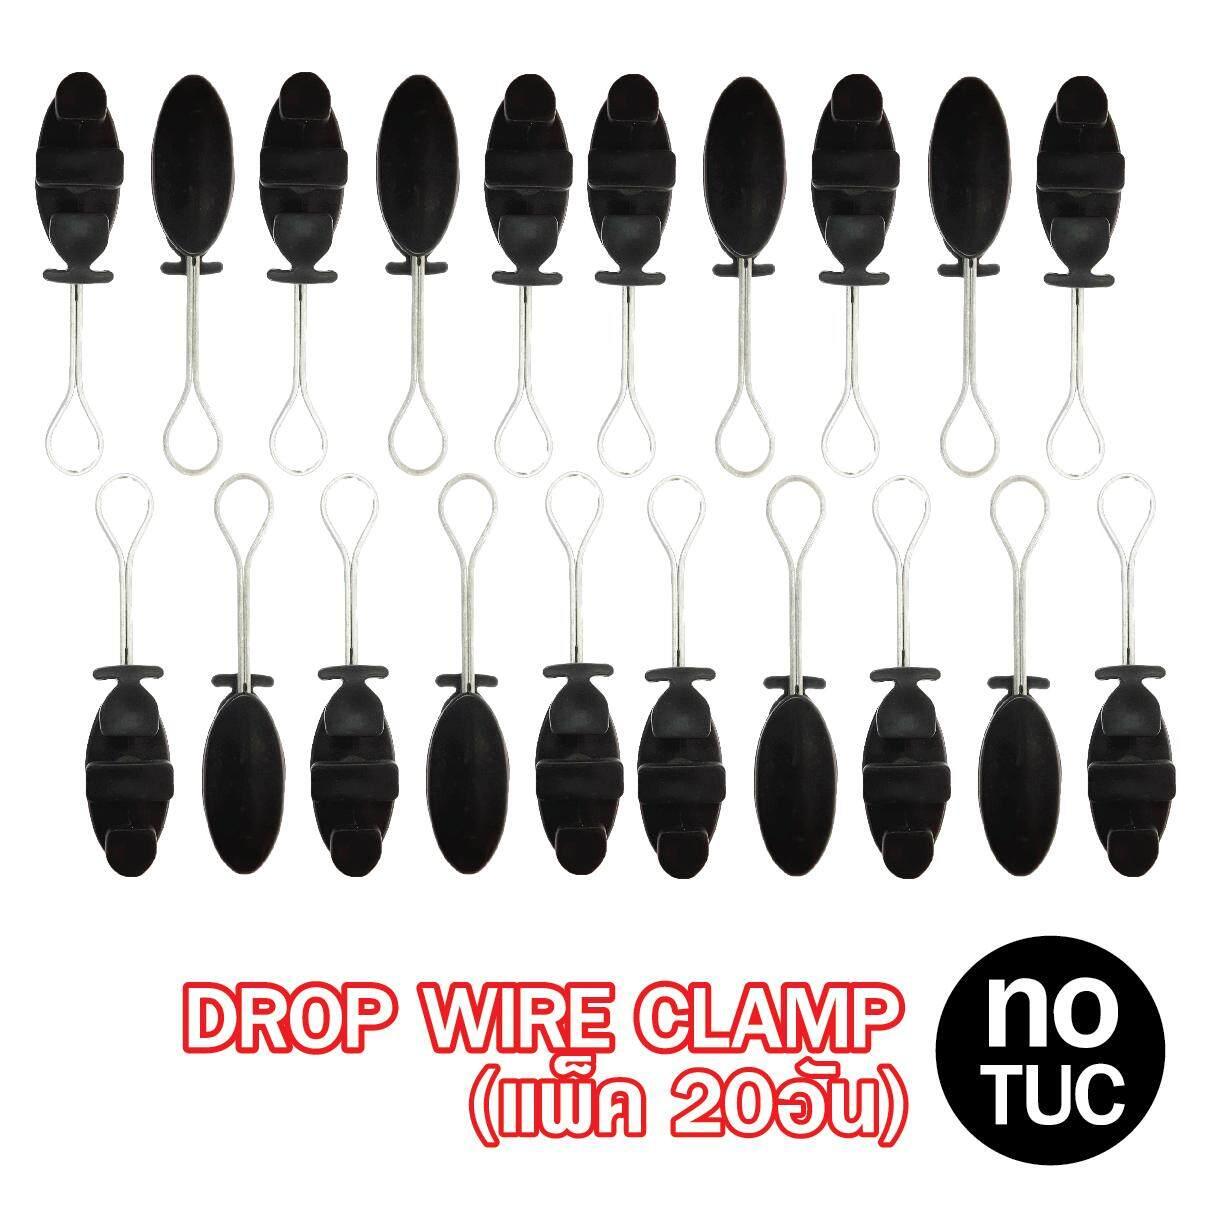 DROP WIRE CLAMP ตุ๊กตาเกี่่ยวสลิง รุ่น สีดำ (แพ็ค 20อัน)